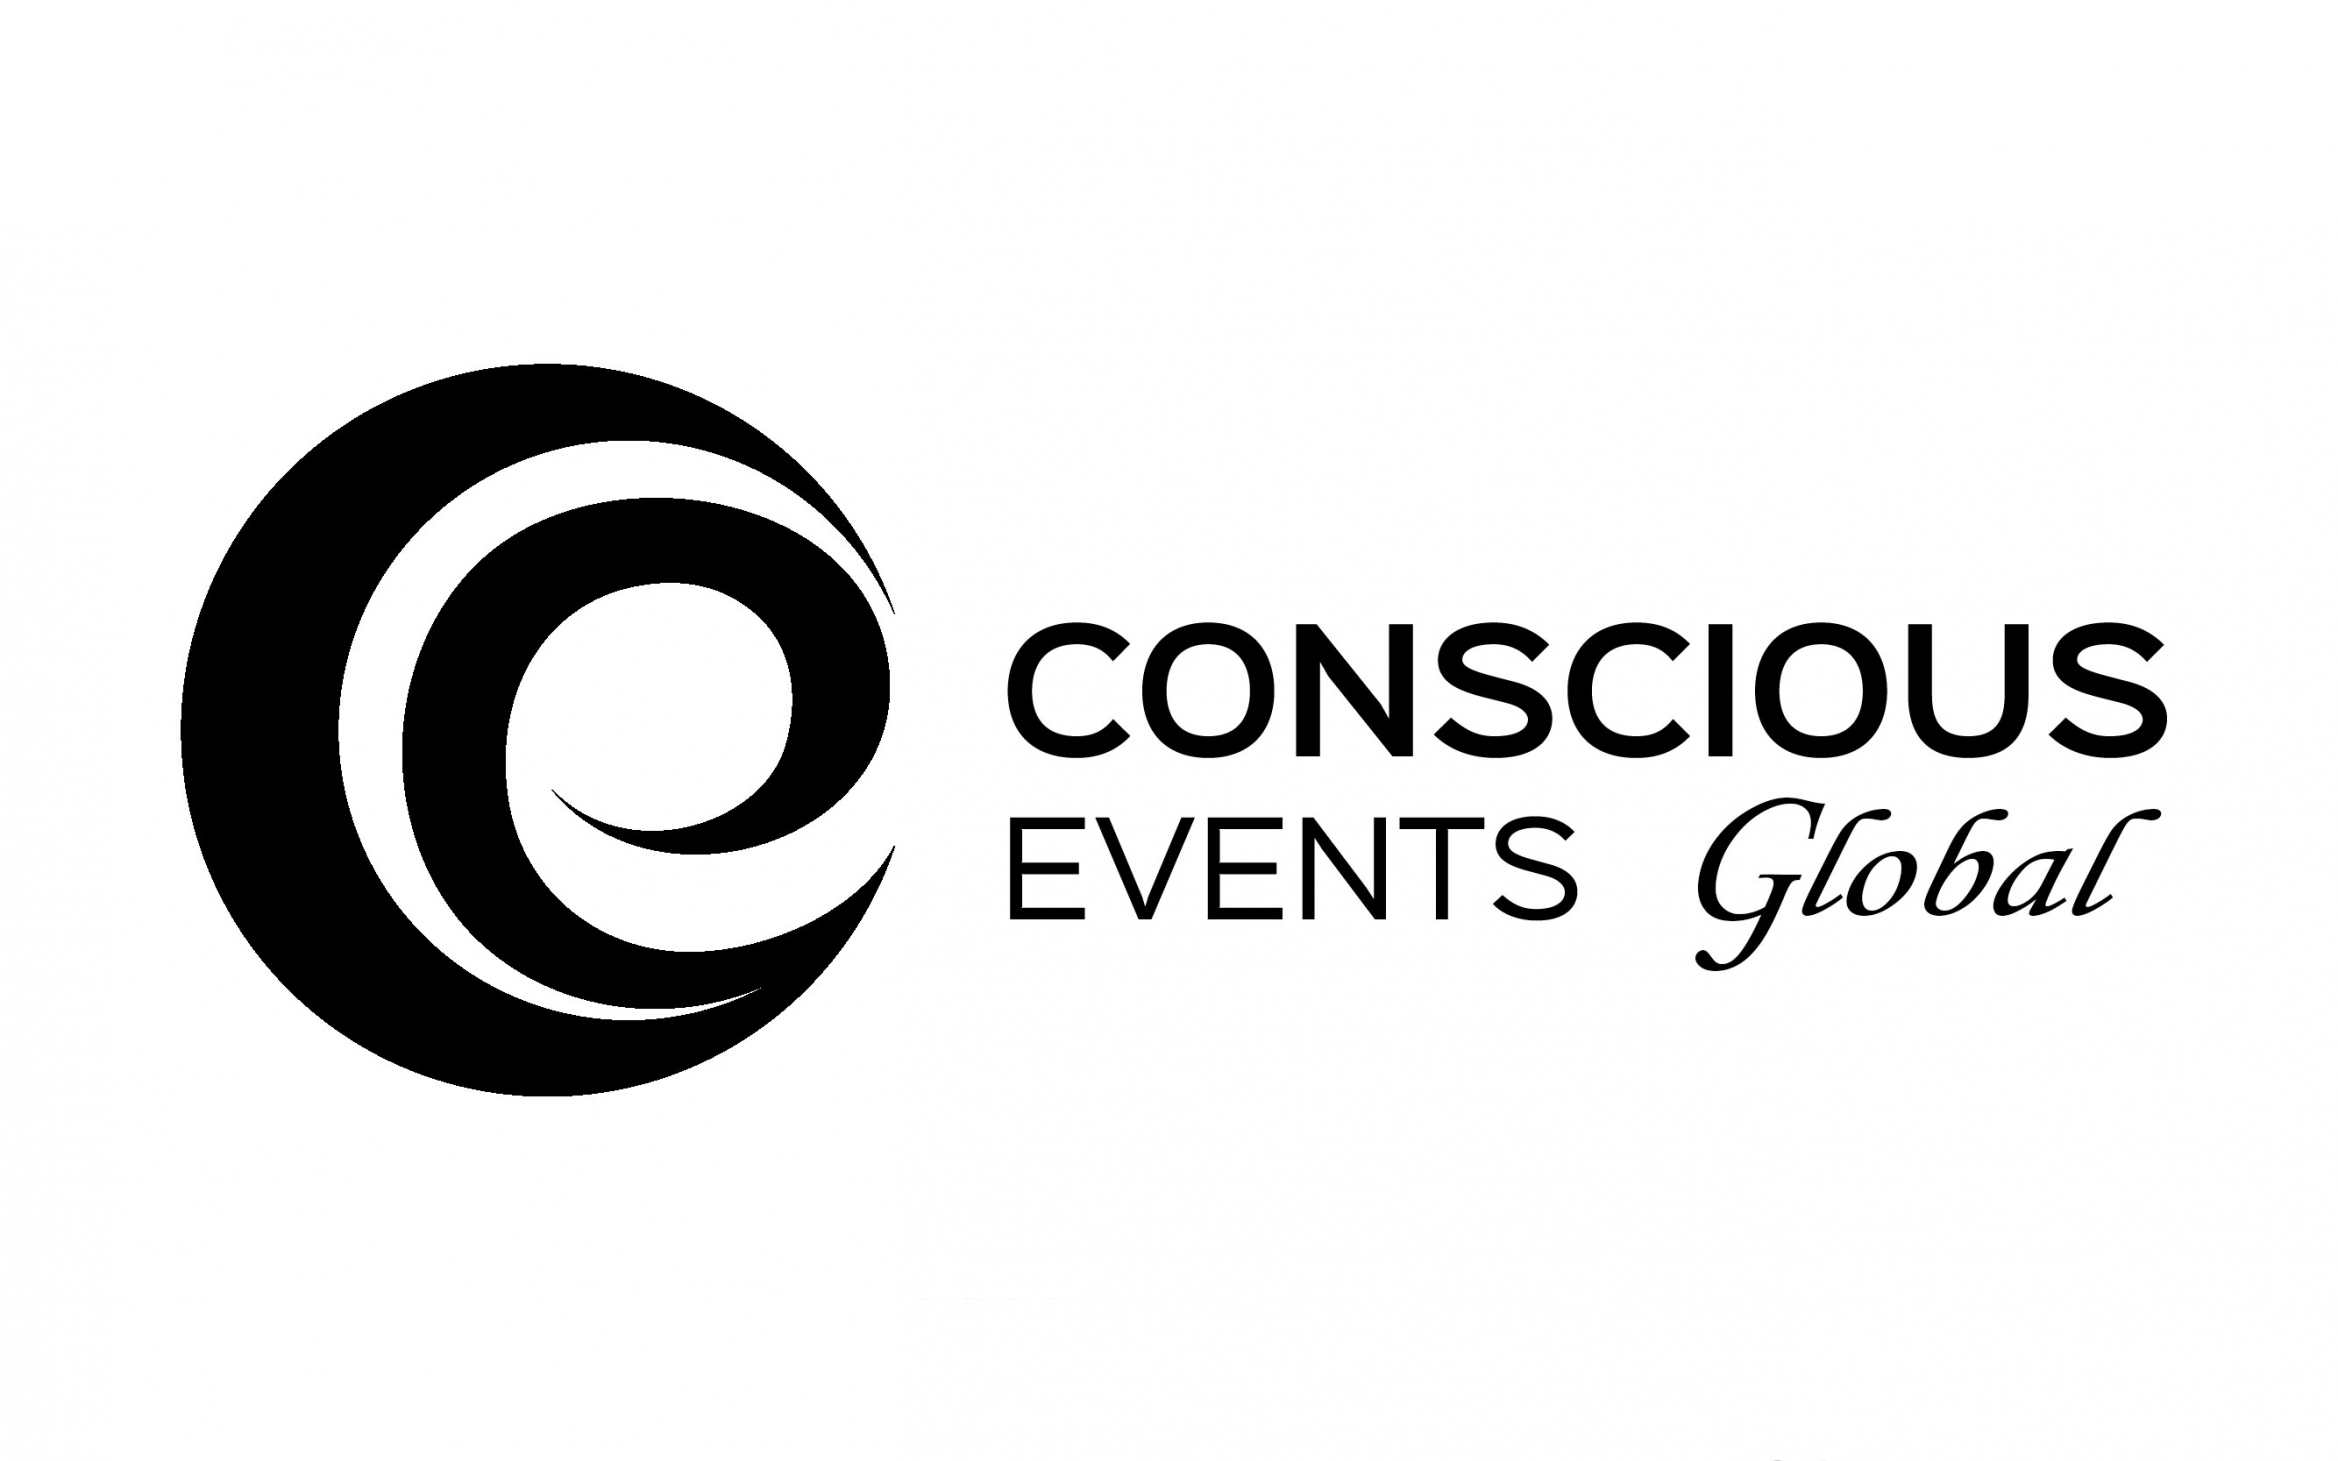 CONSCIOUS EVENTS GLOBAL Logo